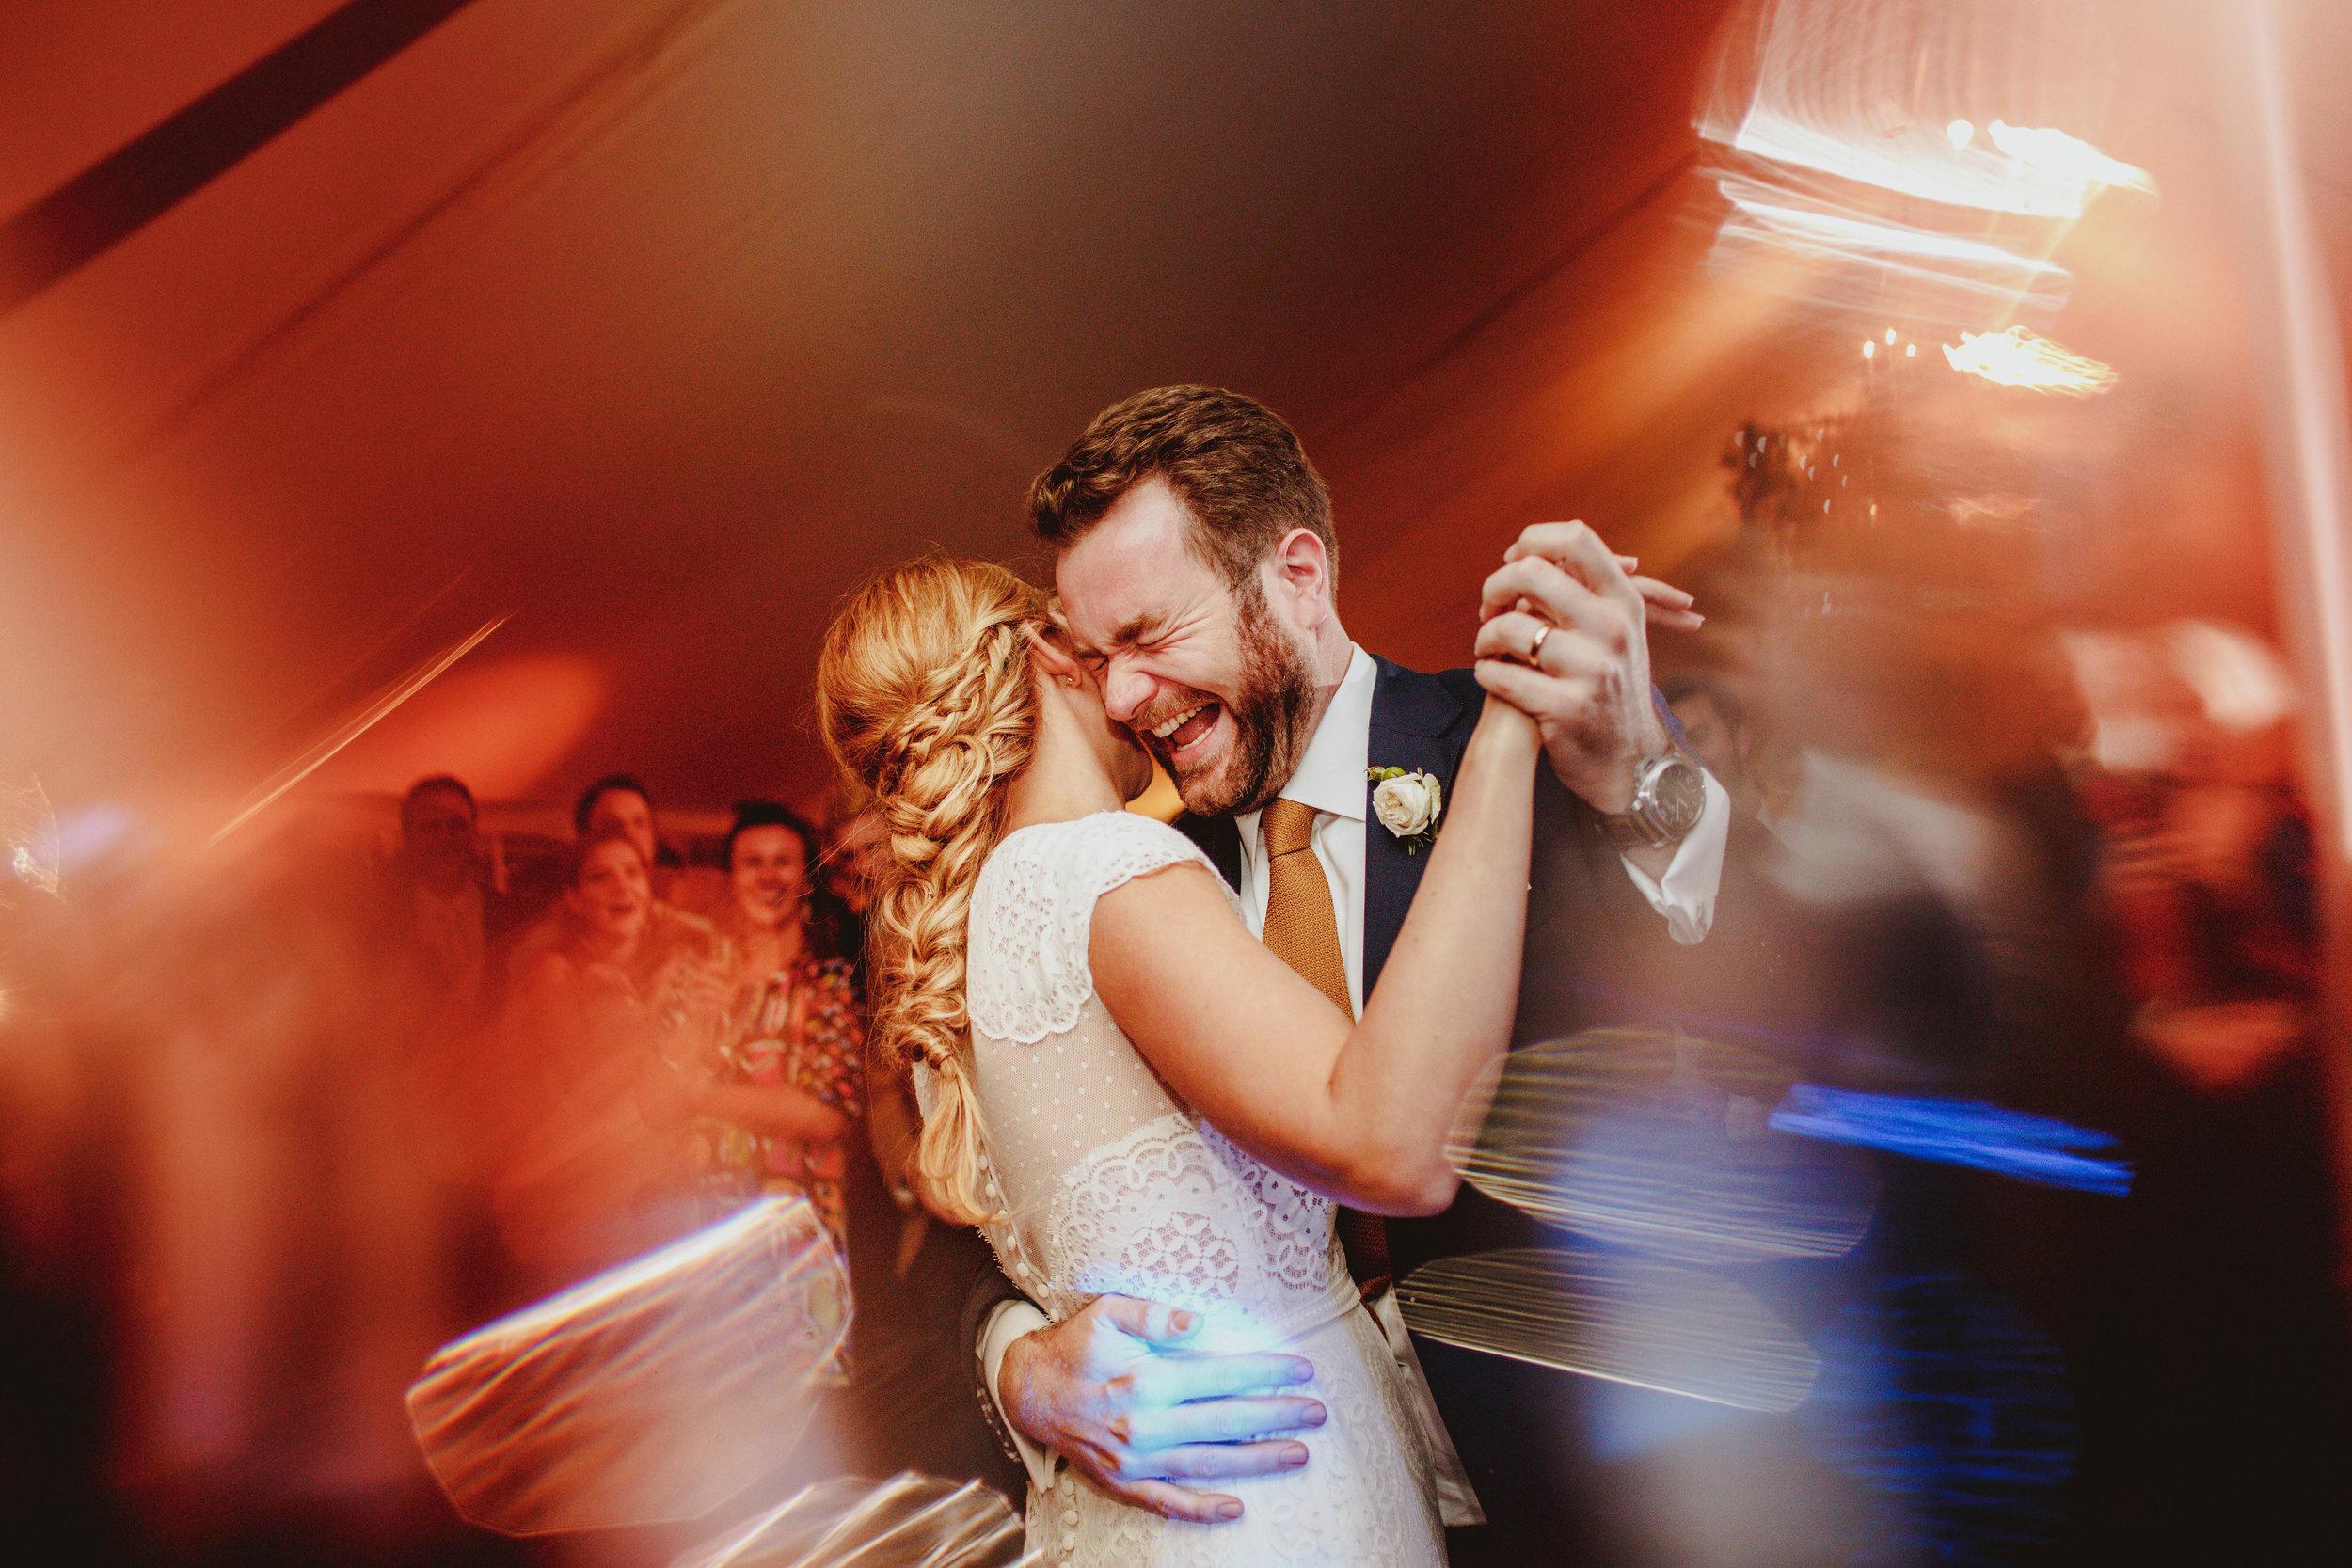 Surrey-wedding-photography-55.jpg